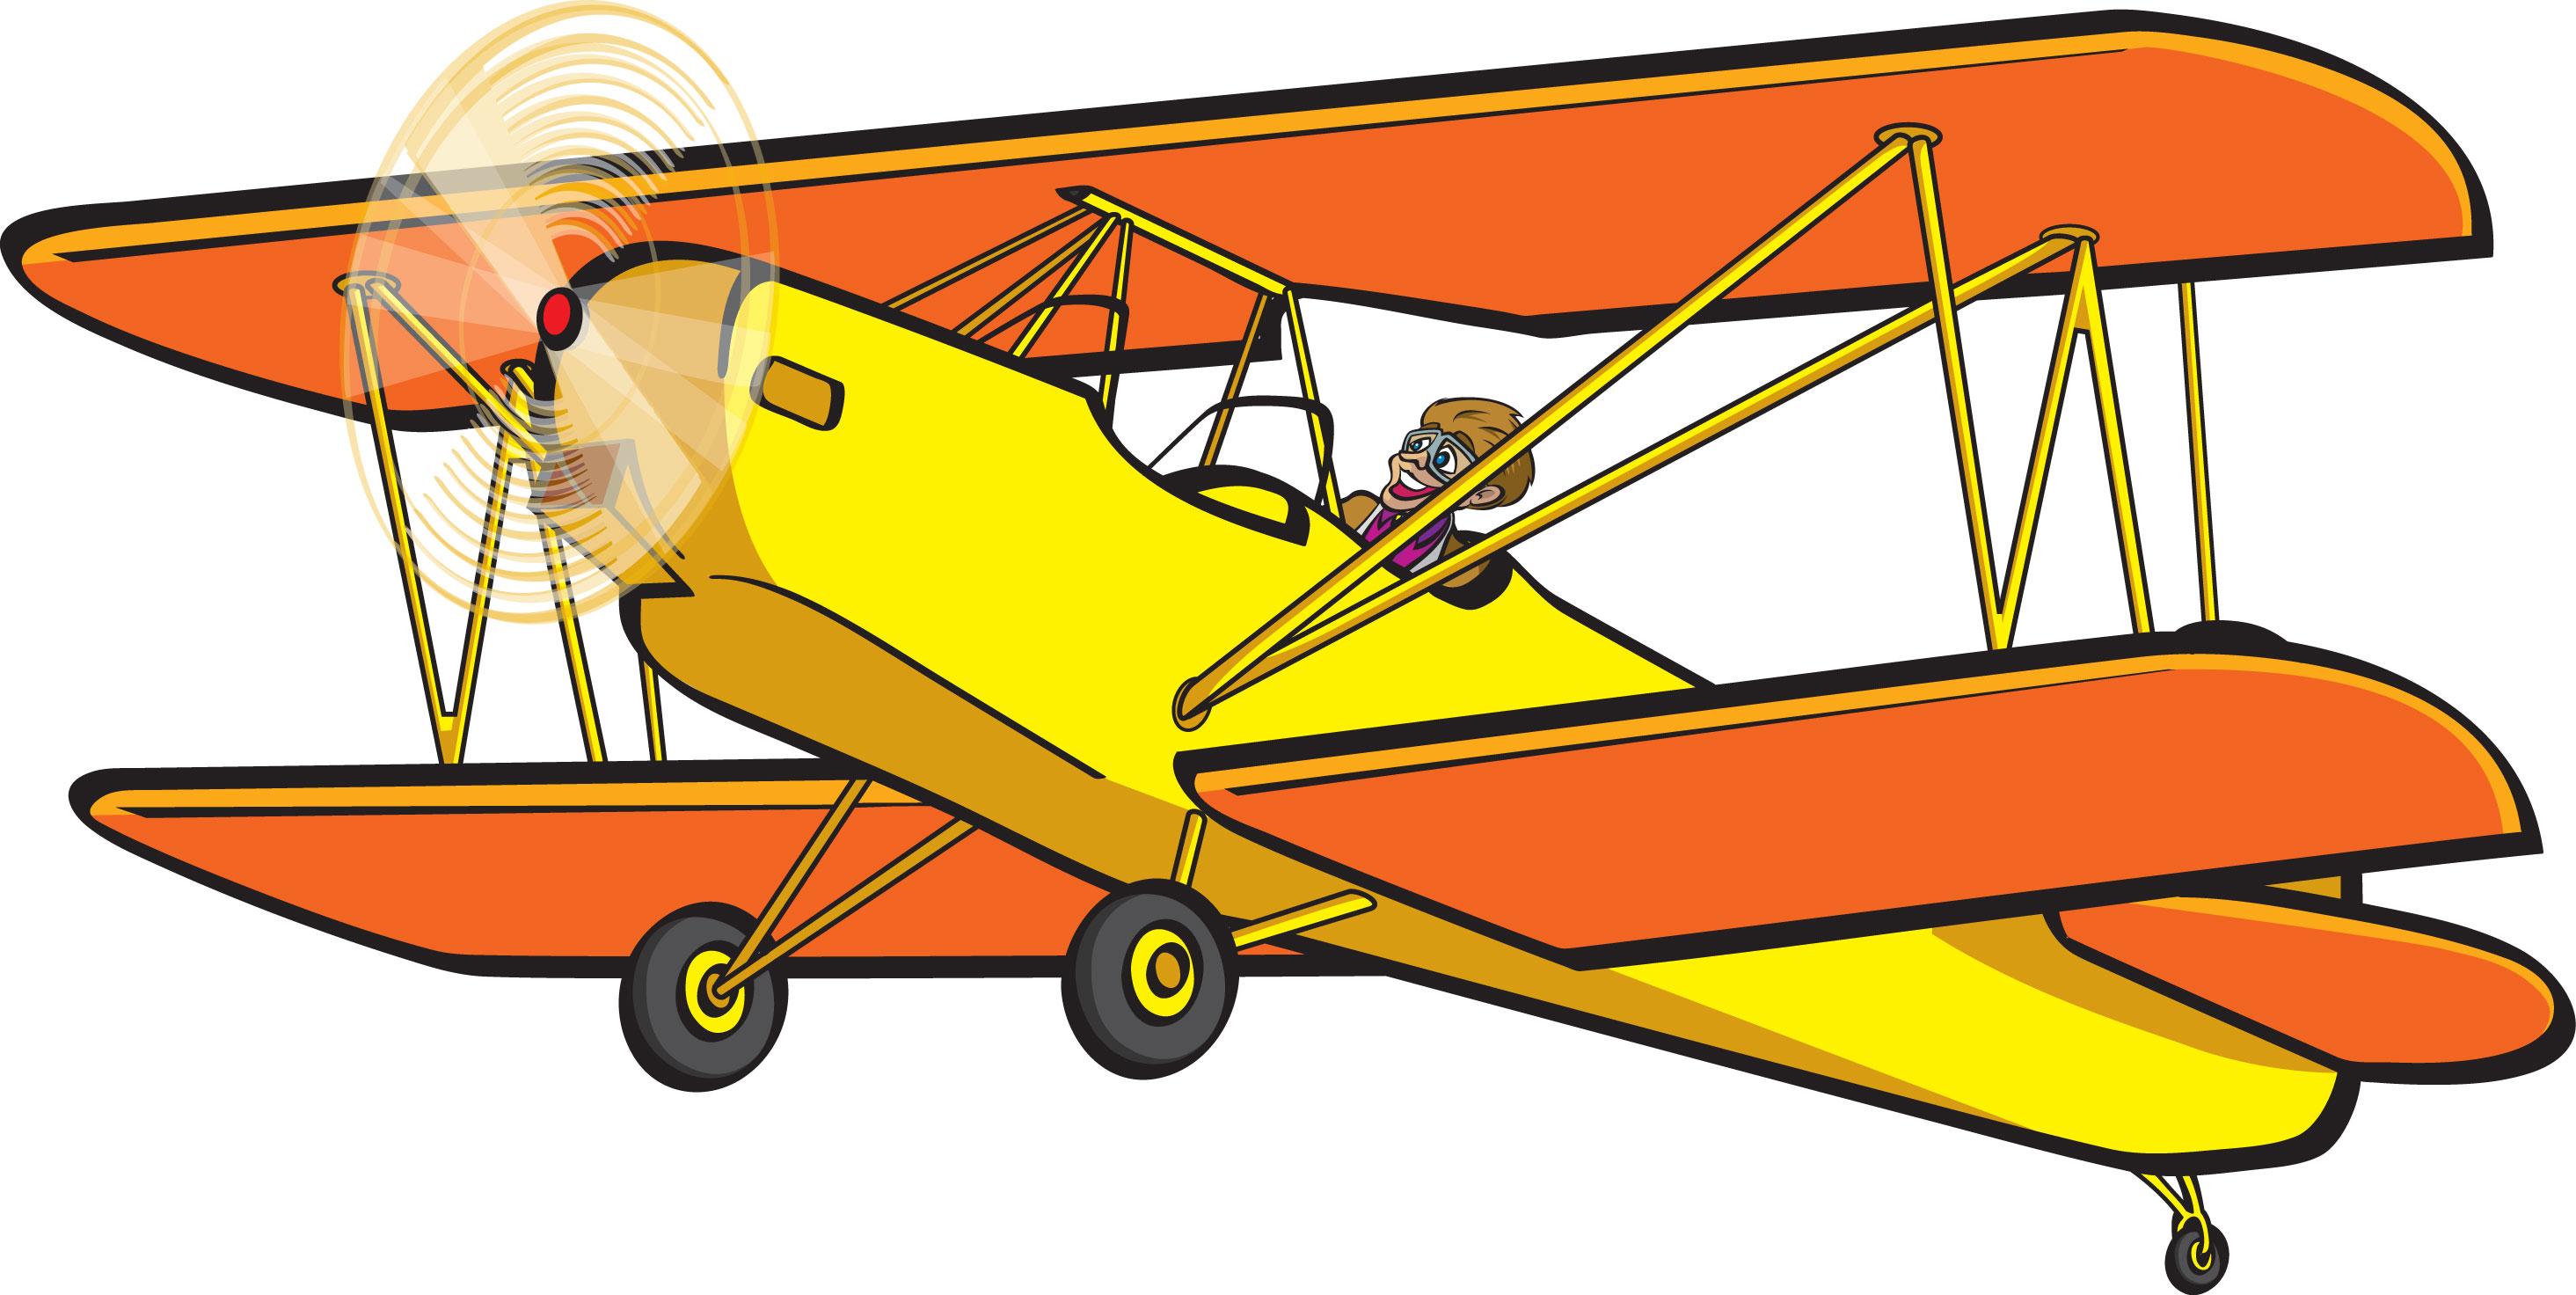 Aviation clipart old plane Biplane Cliparts  Clip Airplane